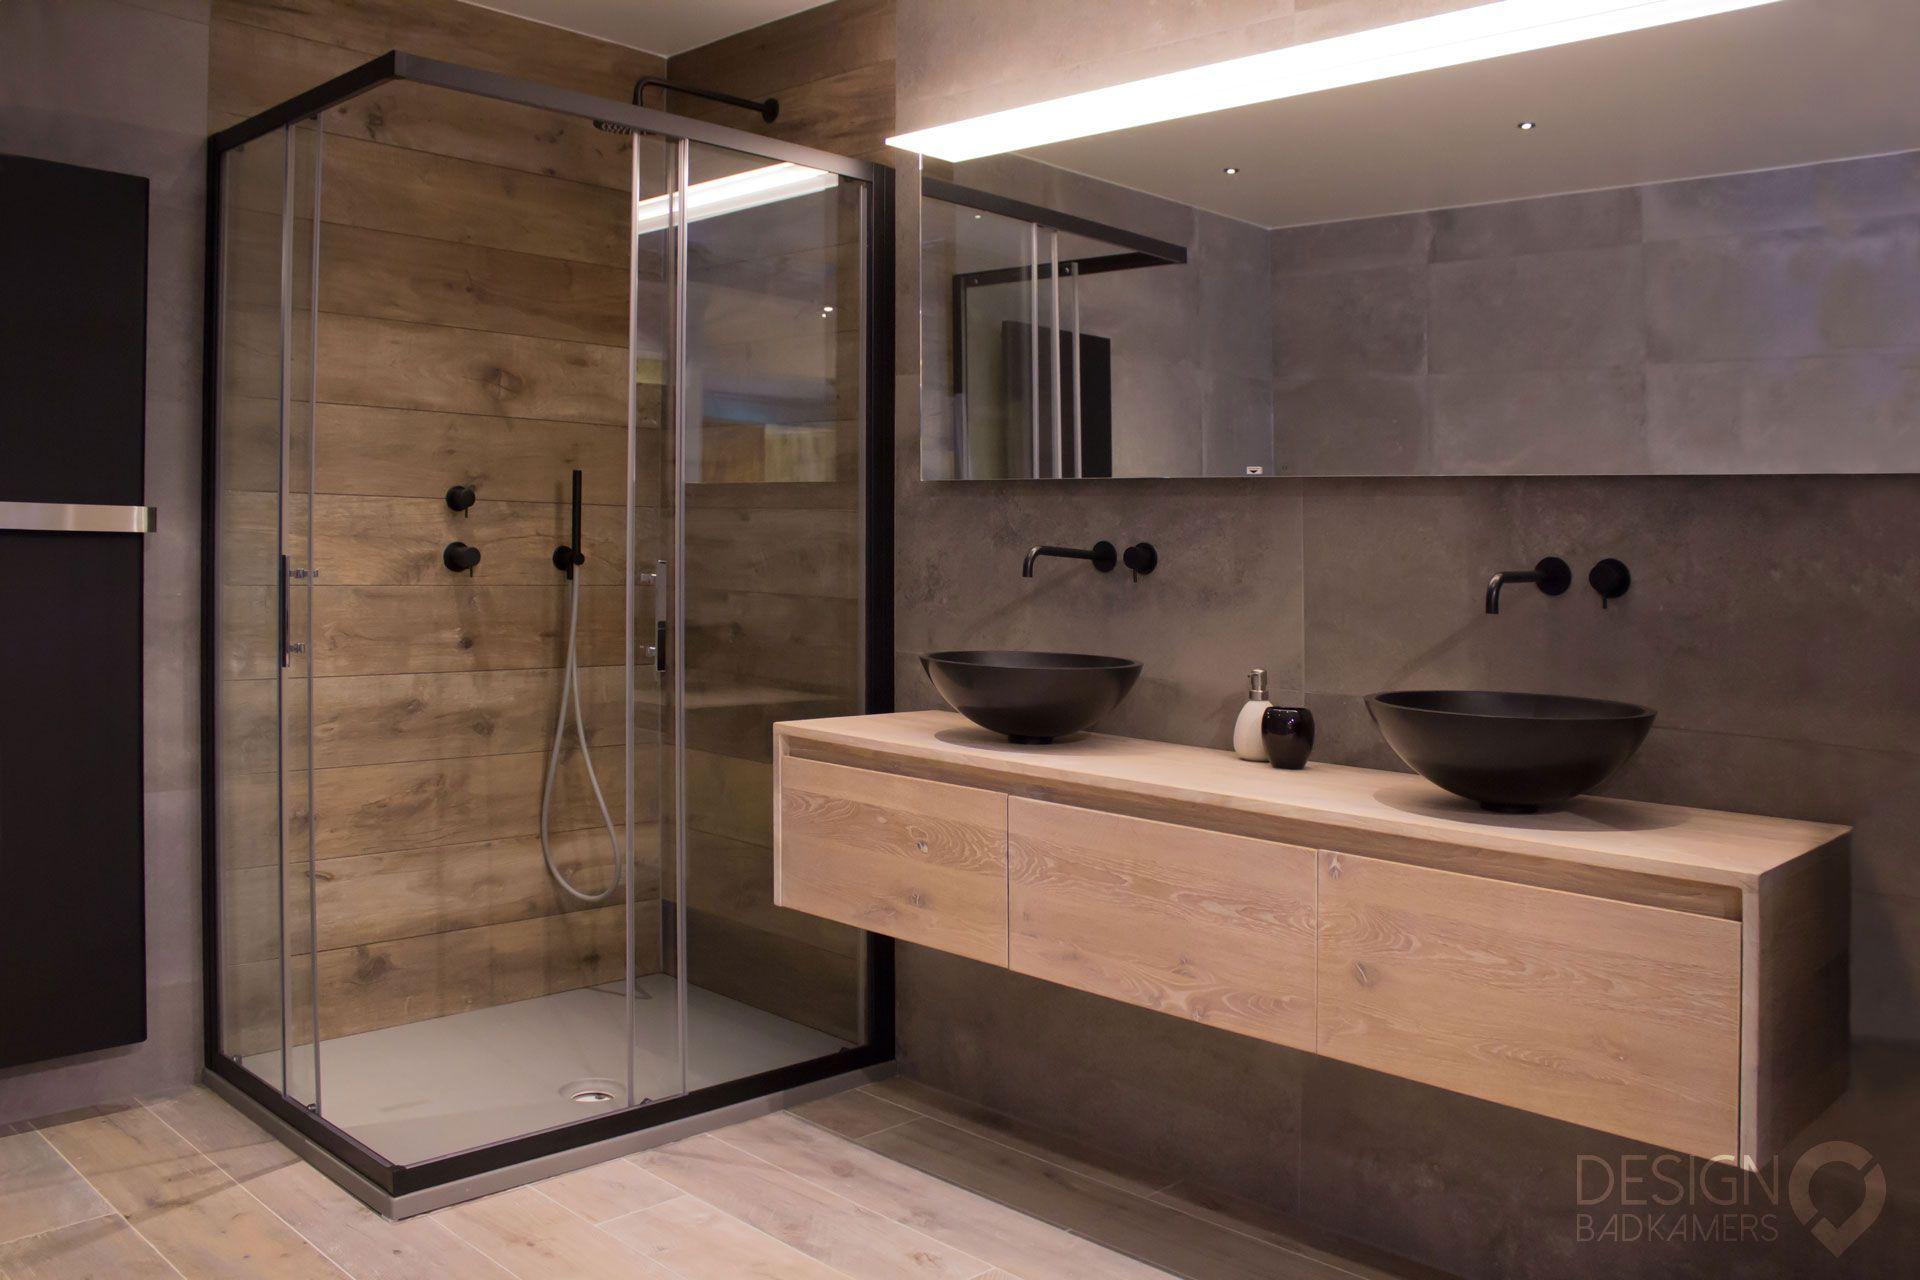 Badkamermeubel Met Kommen : Moderne maatwerk badkamer met kerlite tegels met houtlook op de